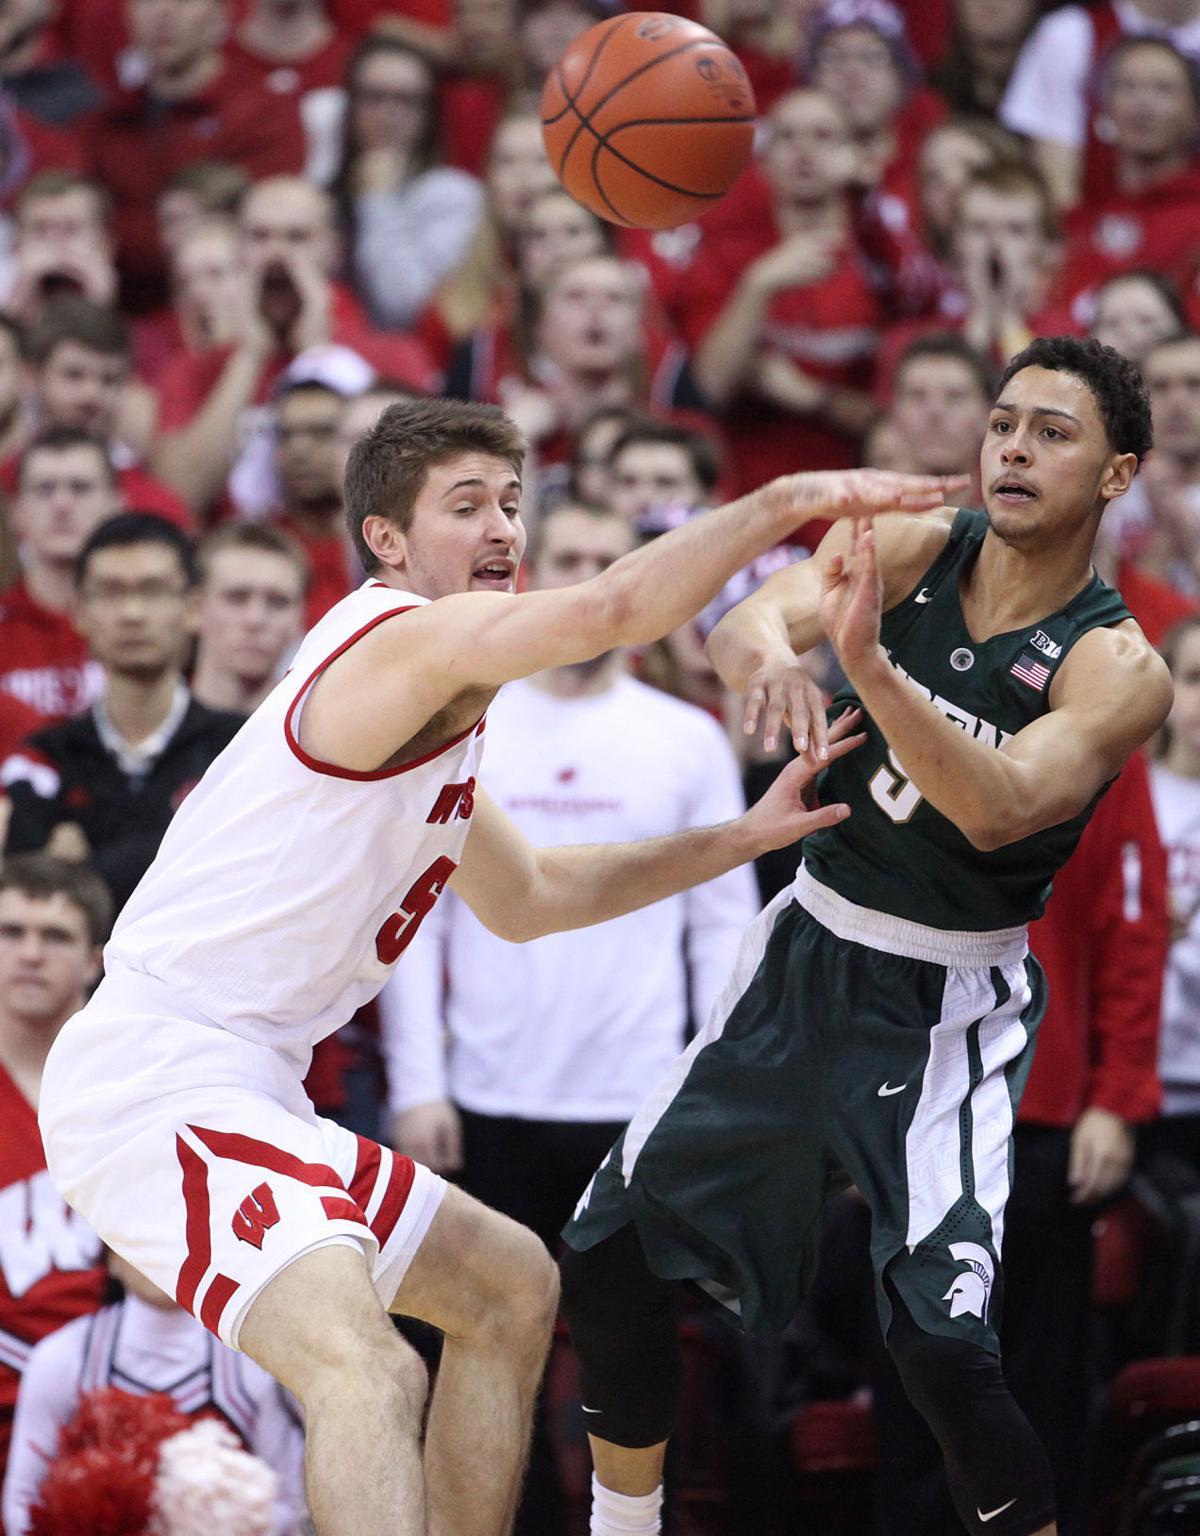 Badgers men's basketball: Aaron Moesch 'story' starting to ...